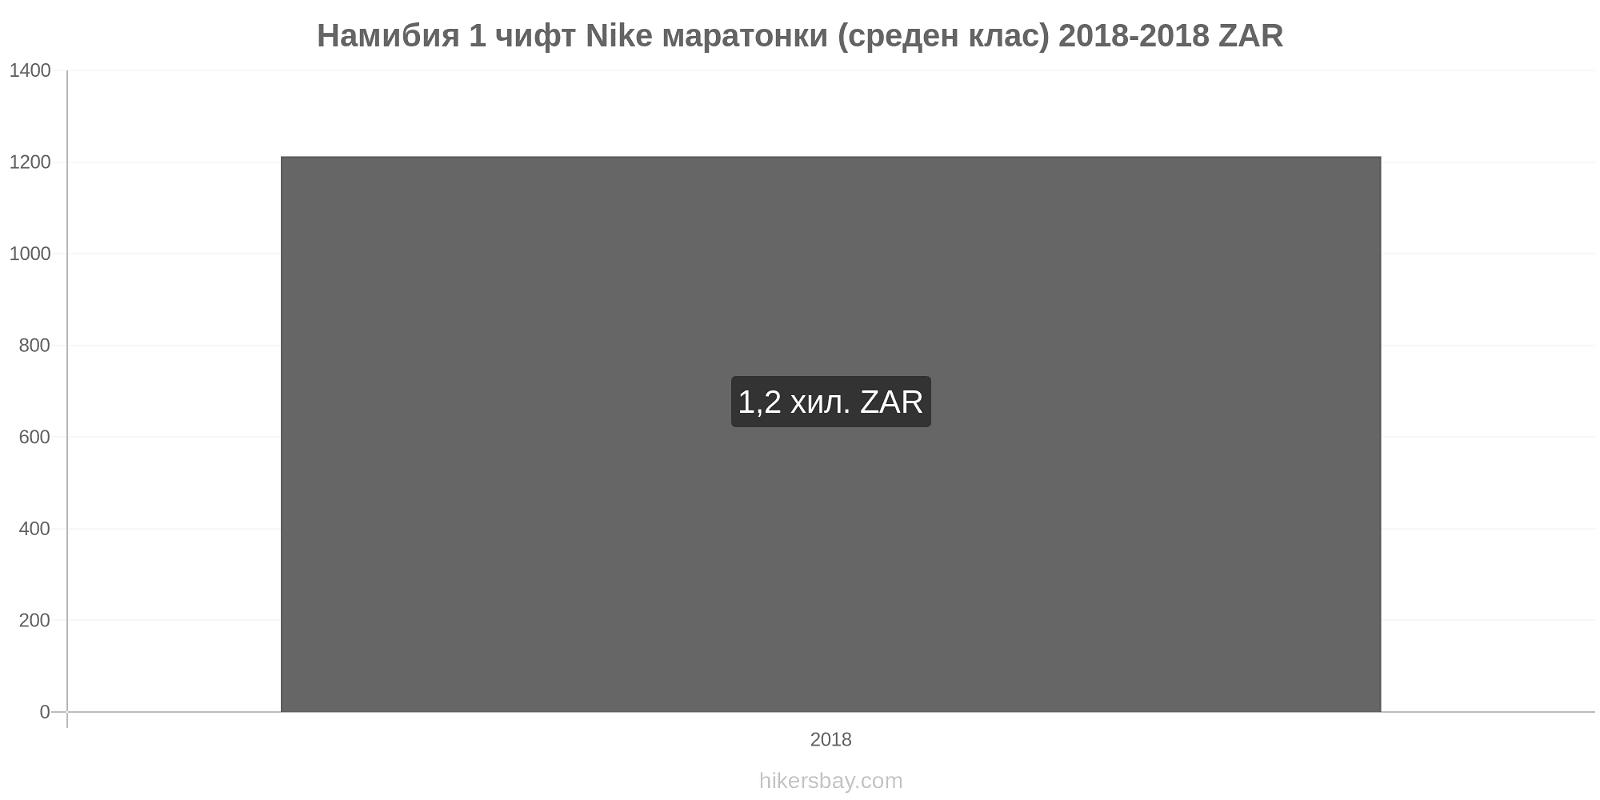 Намибия ценови промени 1 чифт Nike маратонки (среден клас) hikersbay.com